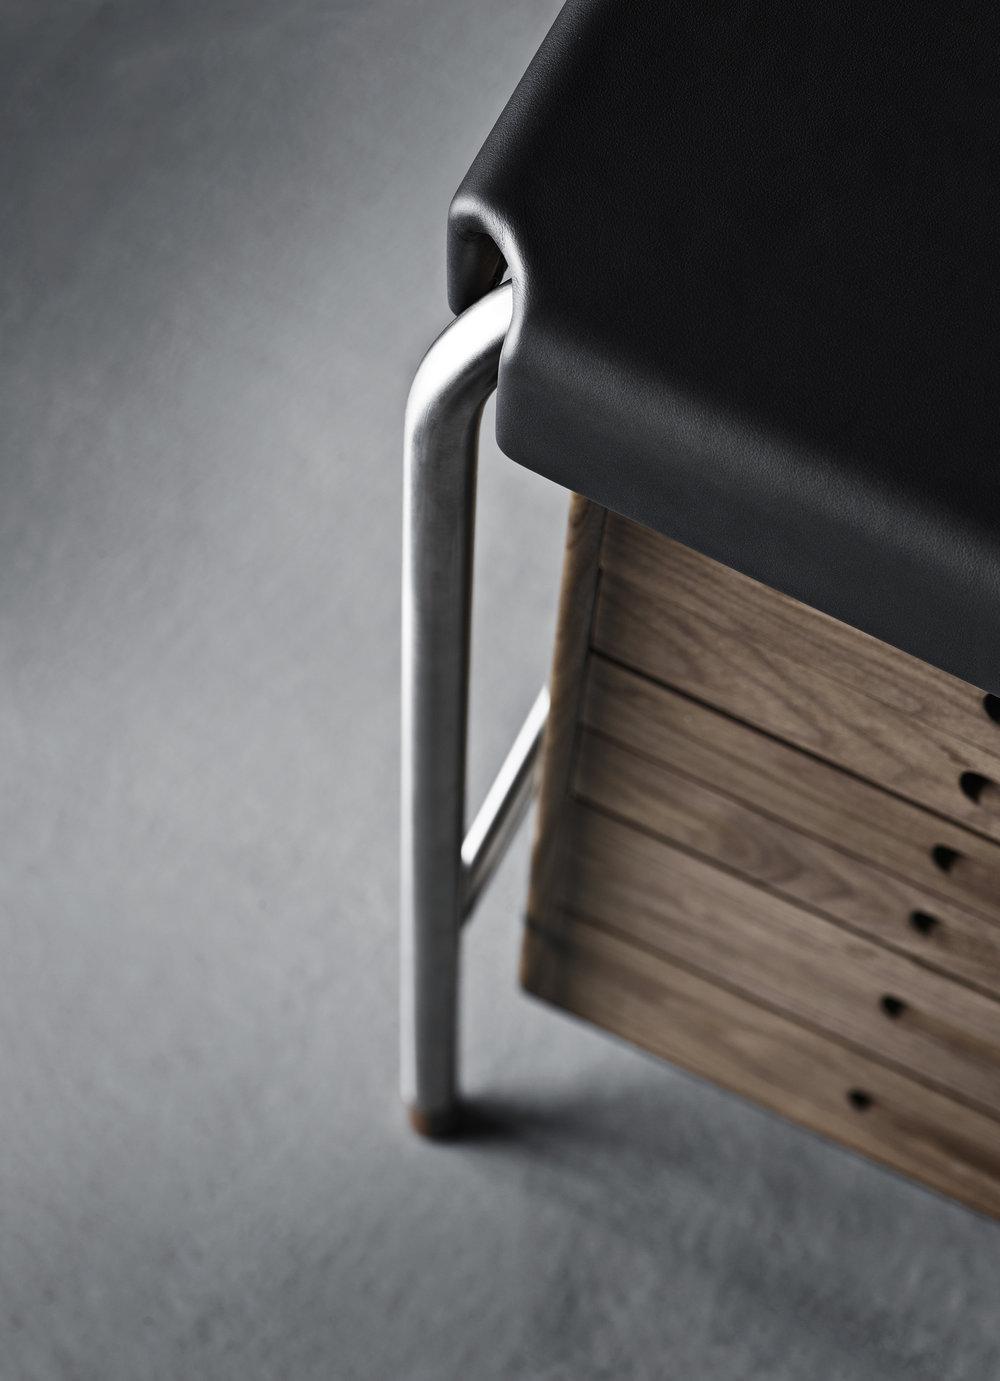 Jacobsen_AJ52-Society-Table-Walnut_Feet-Detail-2.jpg